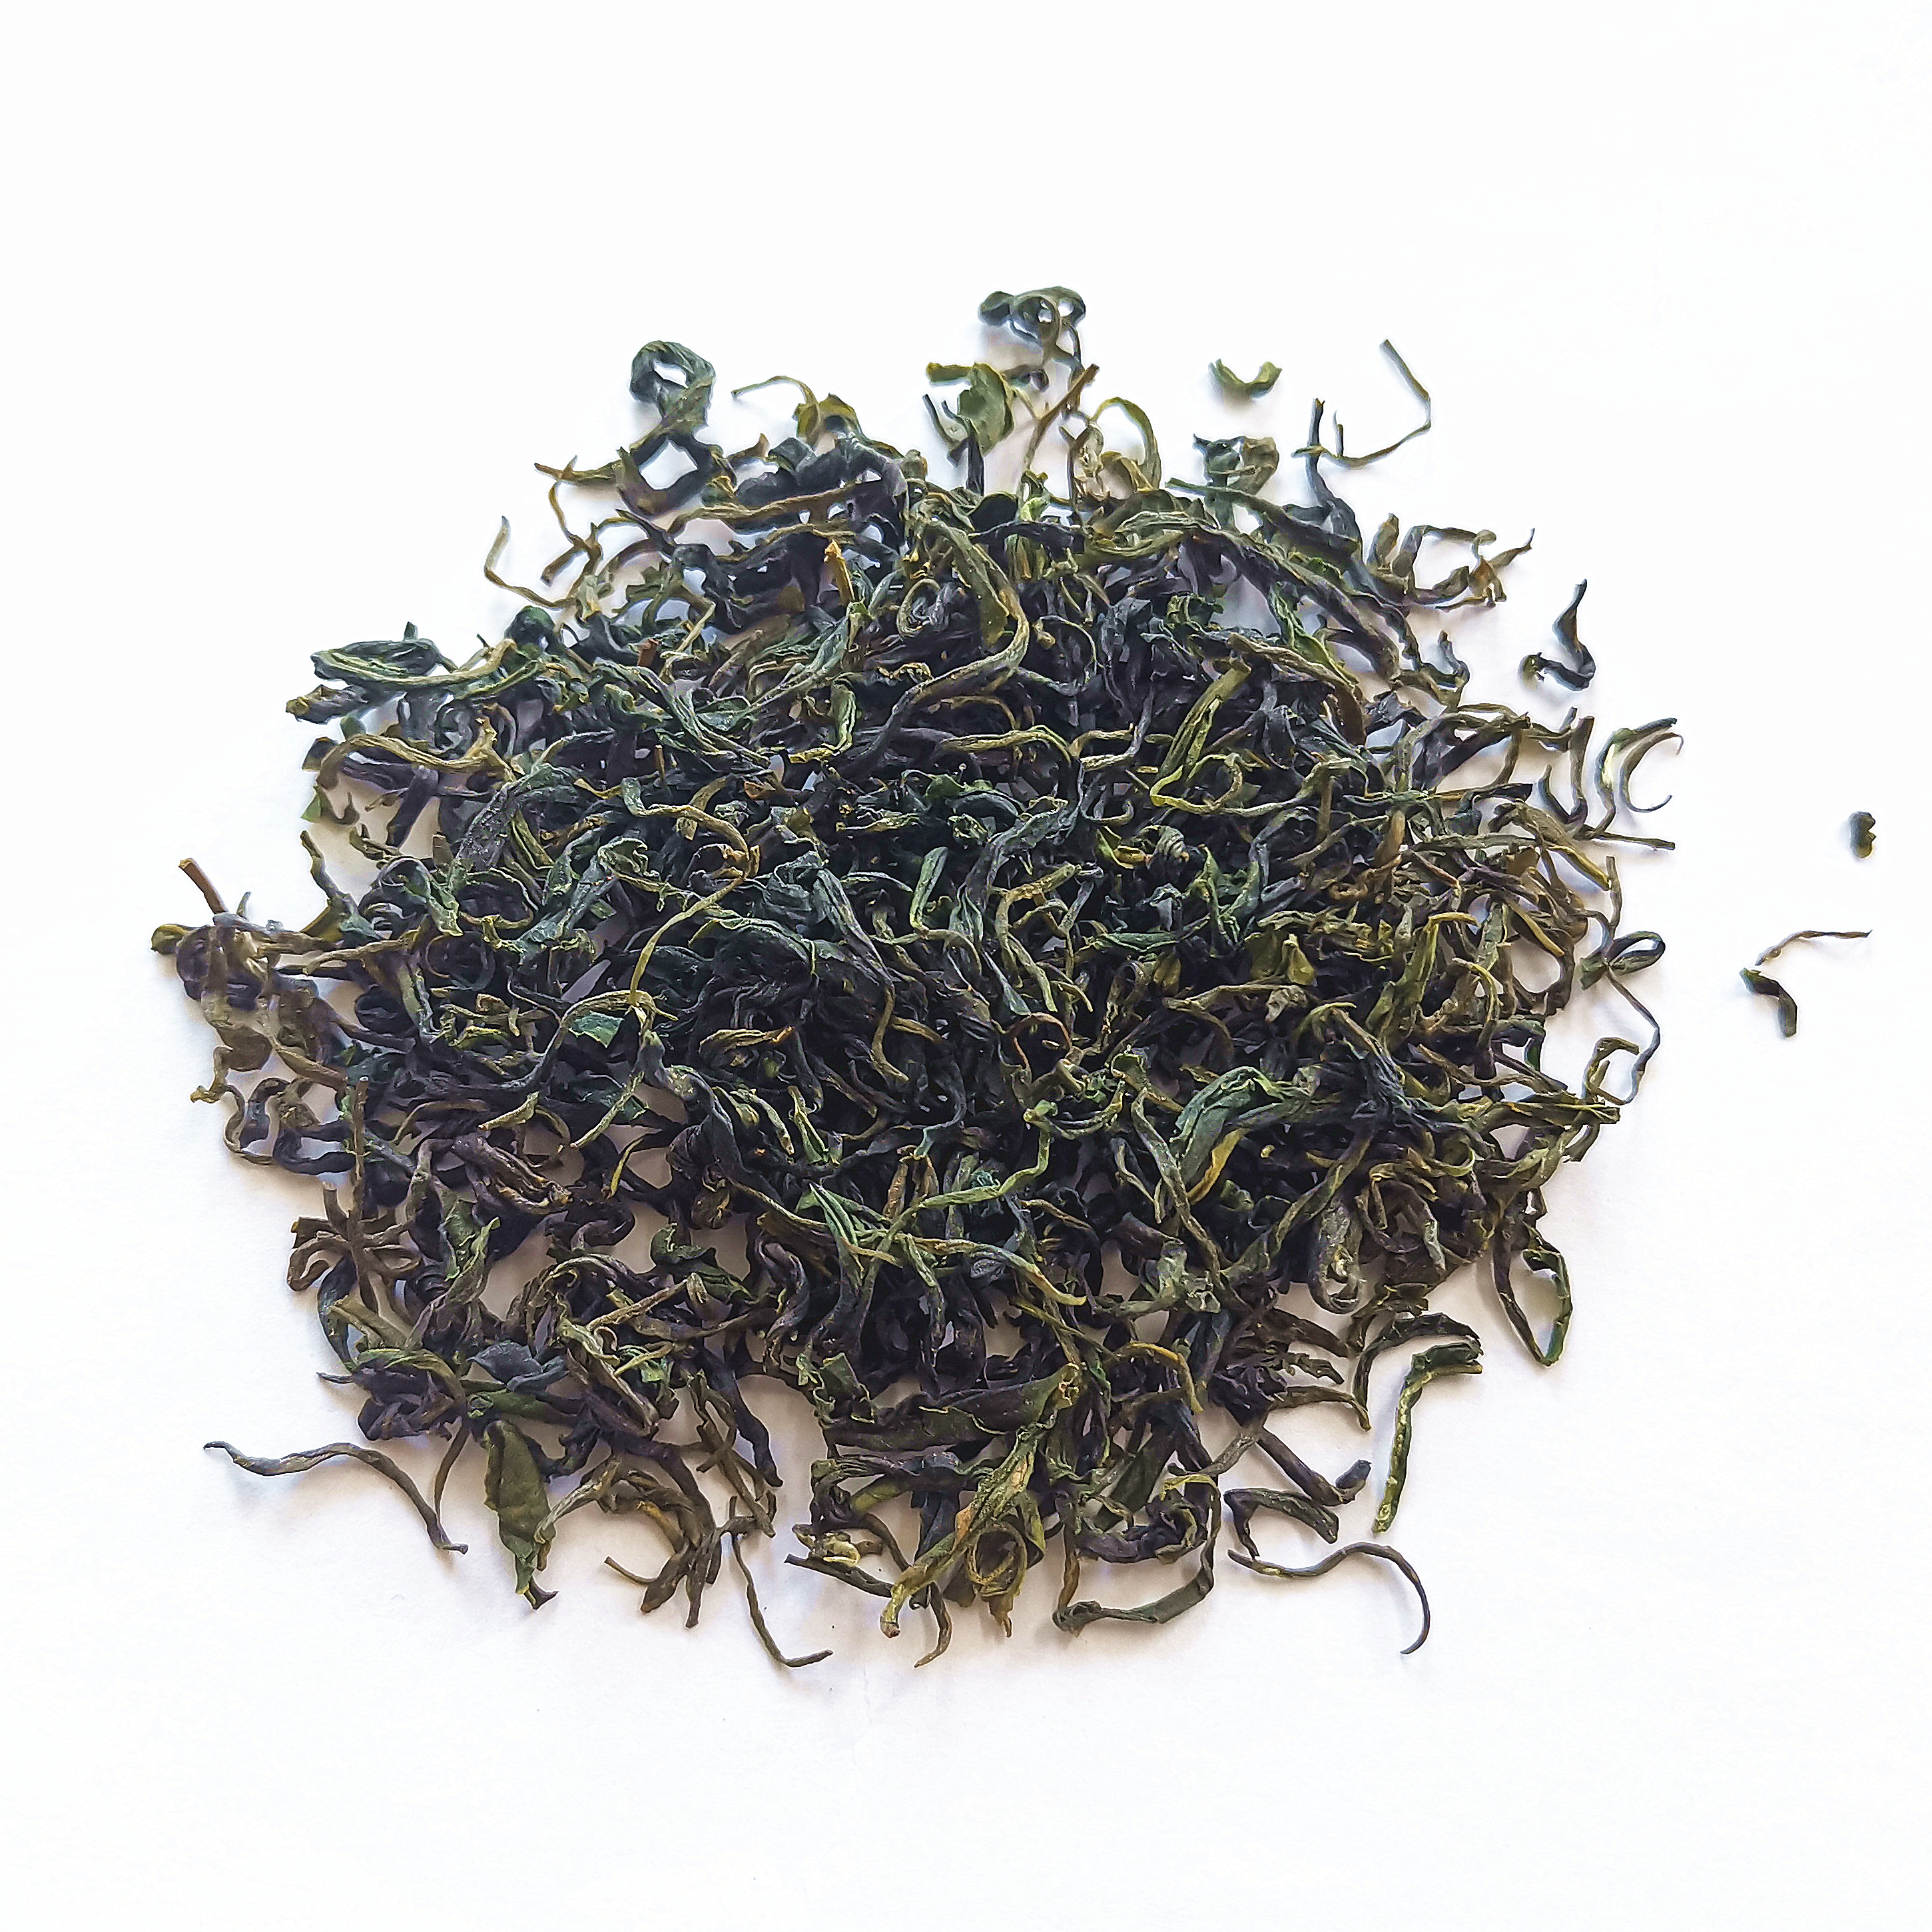 Organic private label loose leaf orthodox tea green - 4uTea | 4uTea.com